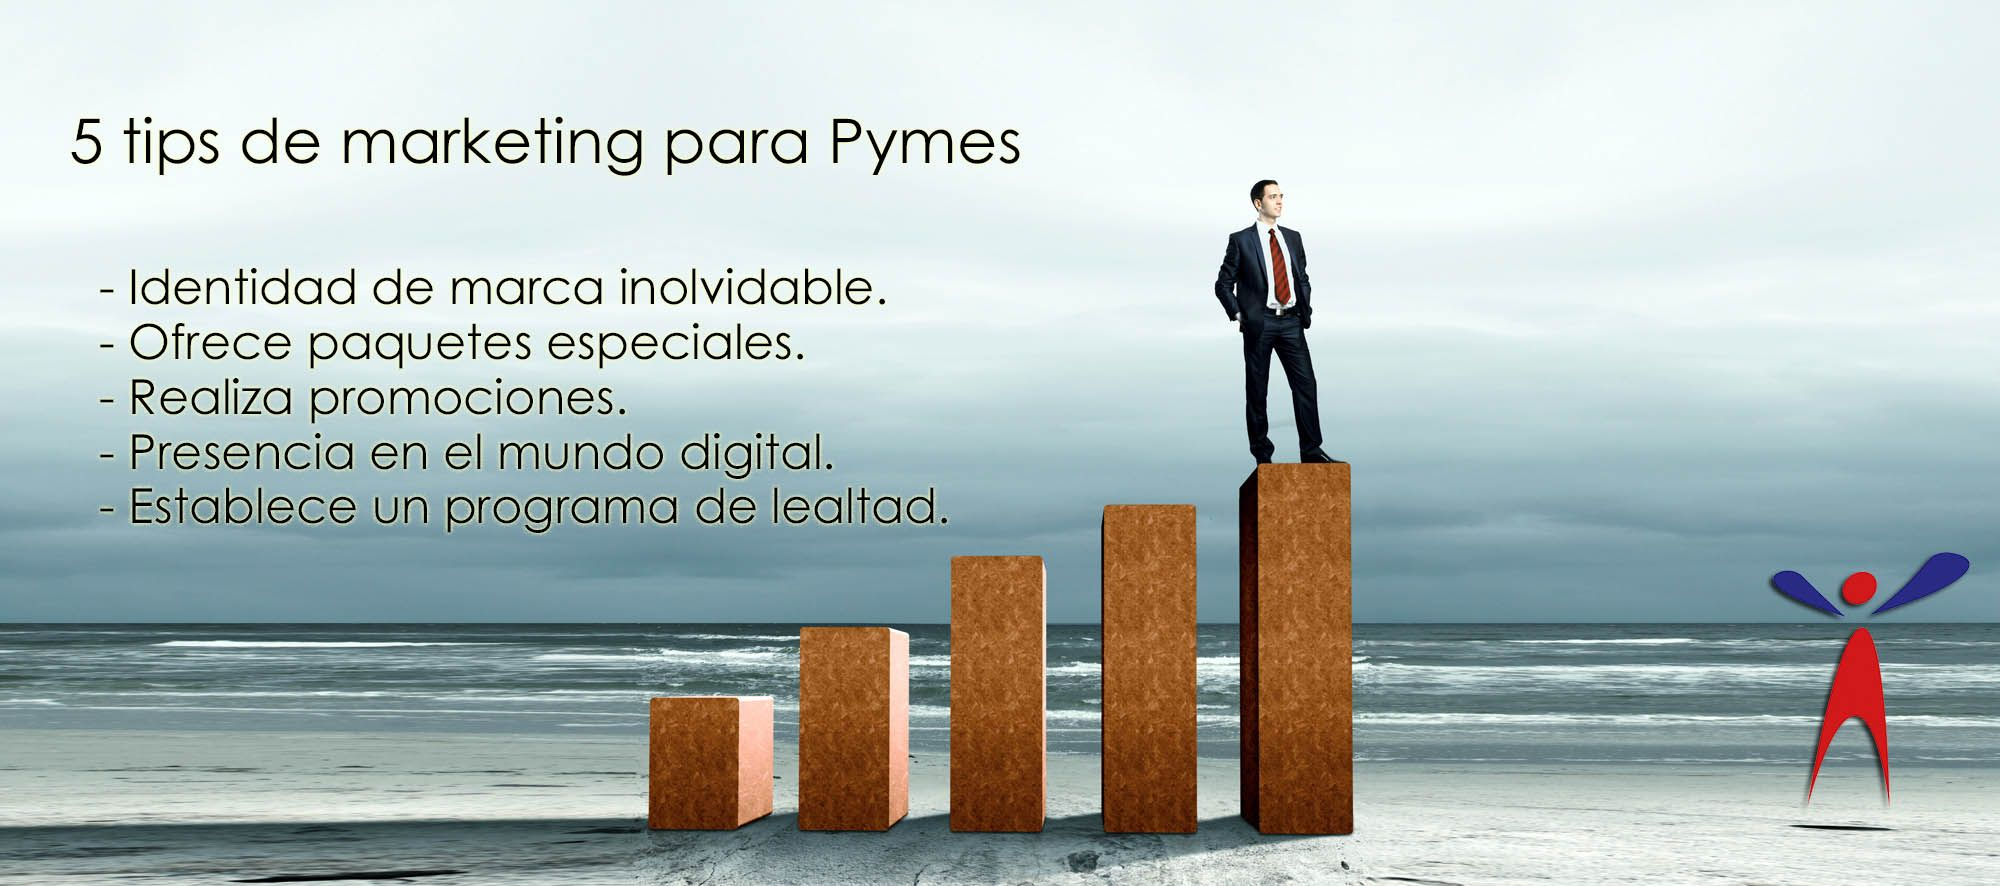 Tips de Marketing para Pymes.